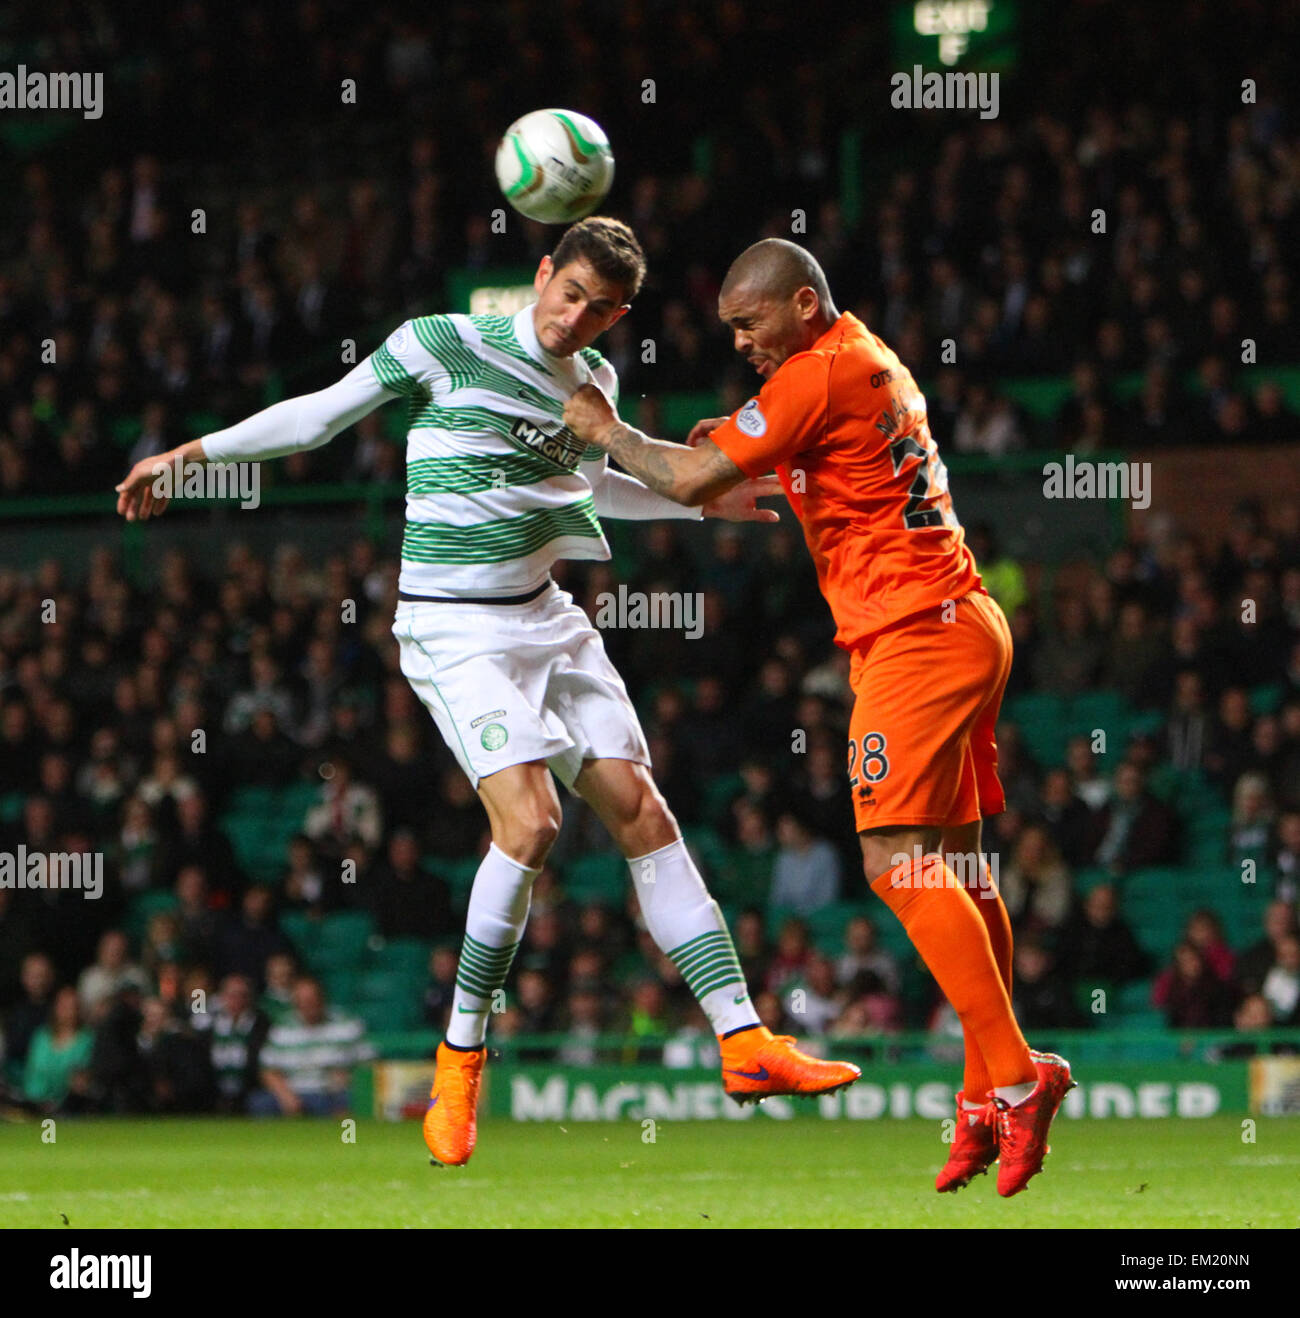 Glasgow, Scotland. 15th Apr, 2015. Scottish Premiership. Celtic versus Kilmarnock. Nir Bitton and Josh Magennis - Stock Image